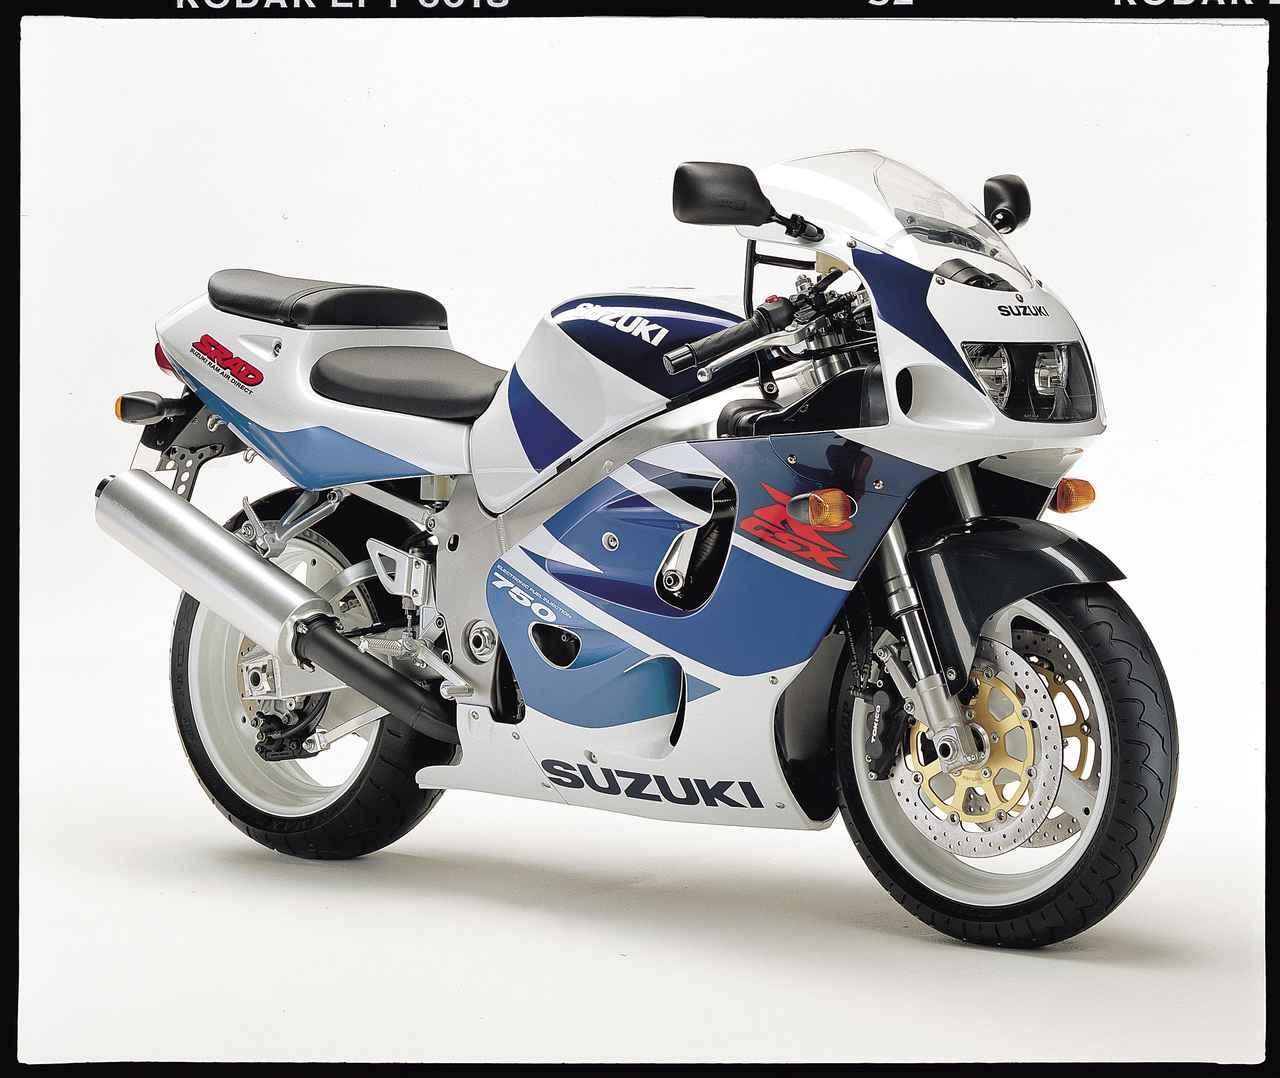 画像: SUZUKI GSX-R750(1996) ●水冷4ストDOHC4バルブ並列4気筒●749㏄●77PS/10000rpm●6.7㎏-m/7500rpm●179㎏●120/70ZR17・190/50ZR17●98万8000円